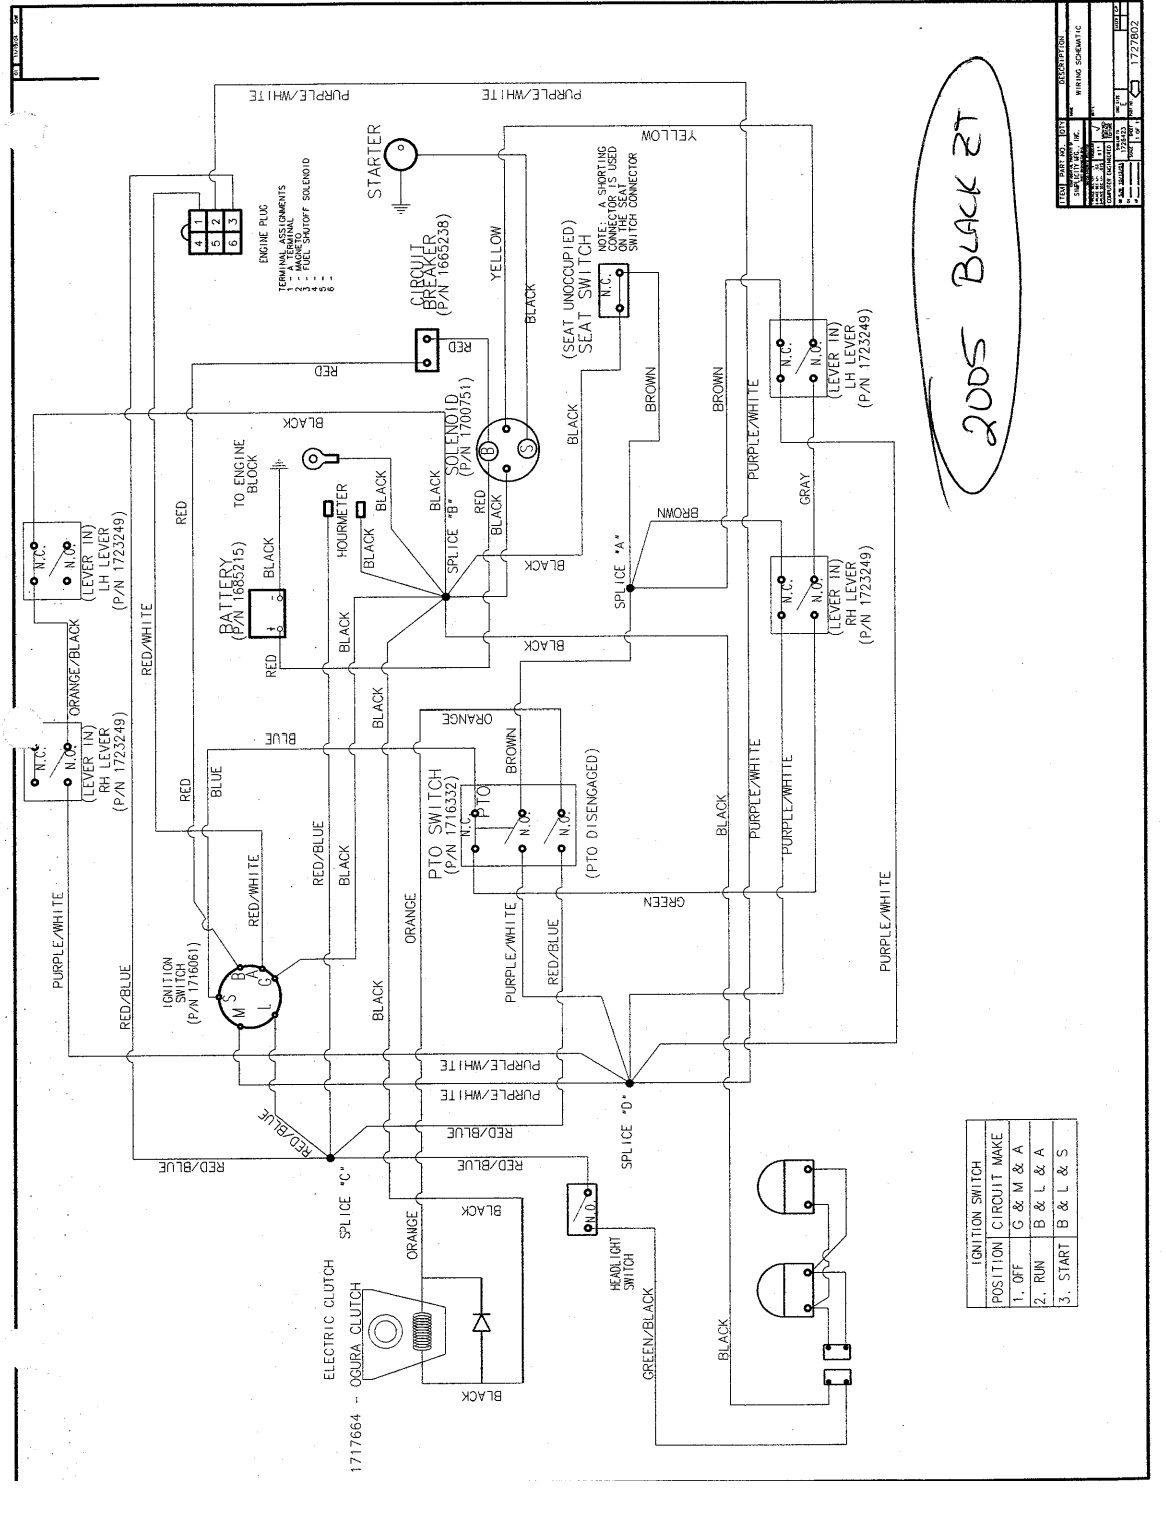 Diagram Ford Tractor Lift Diagram Full Version Hd